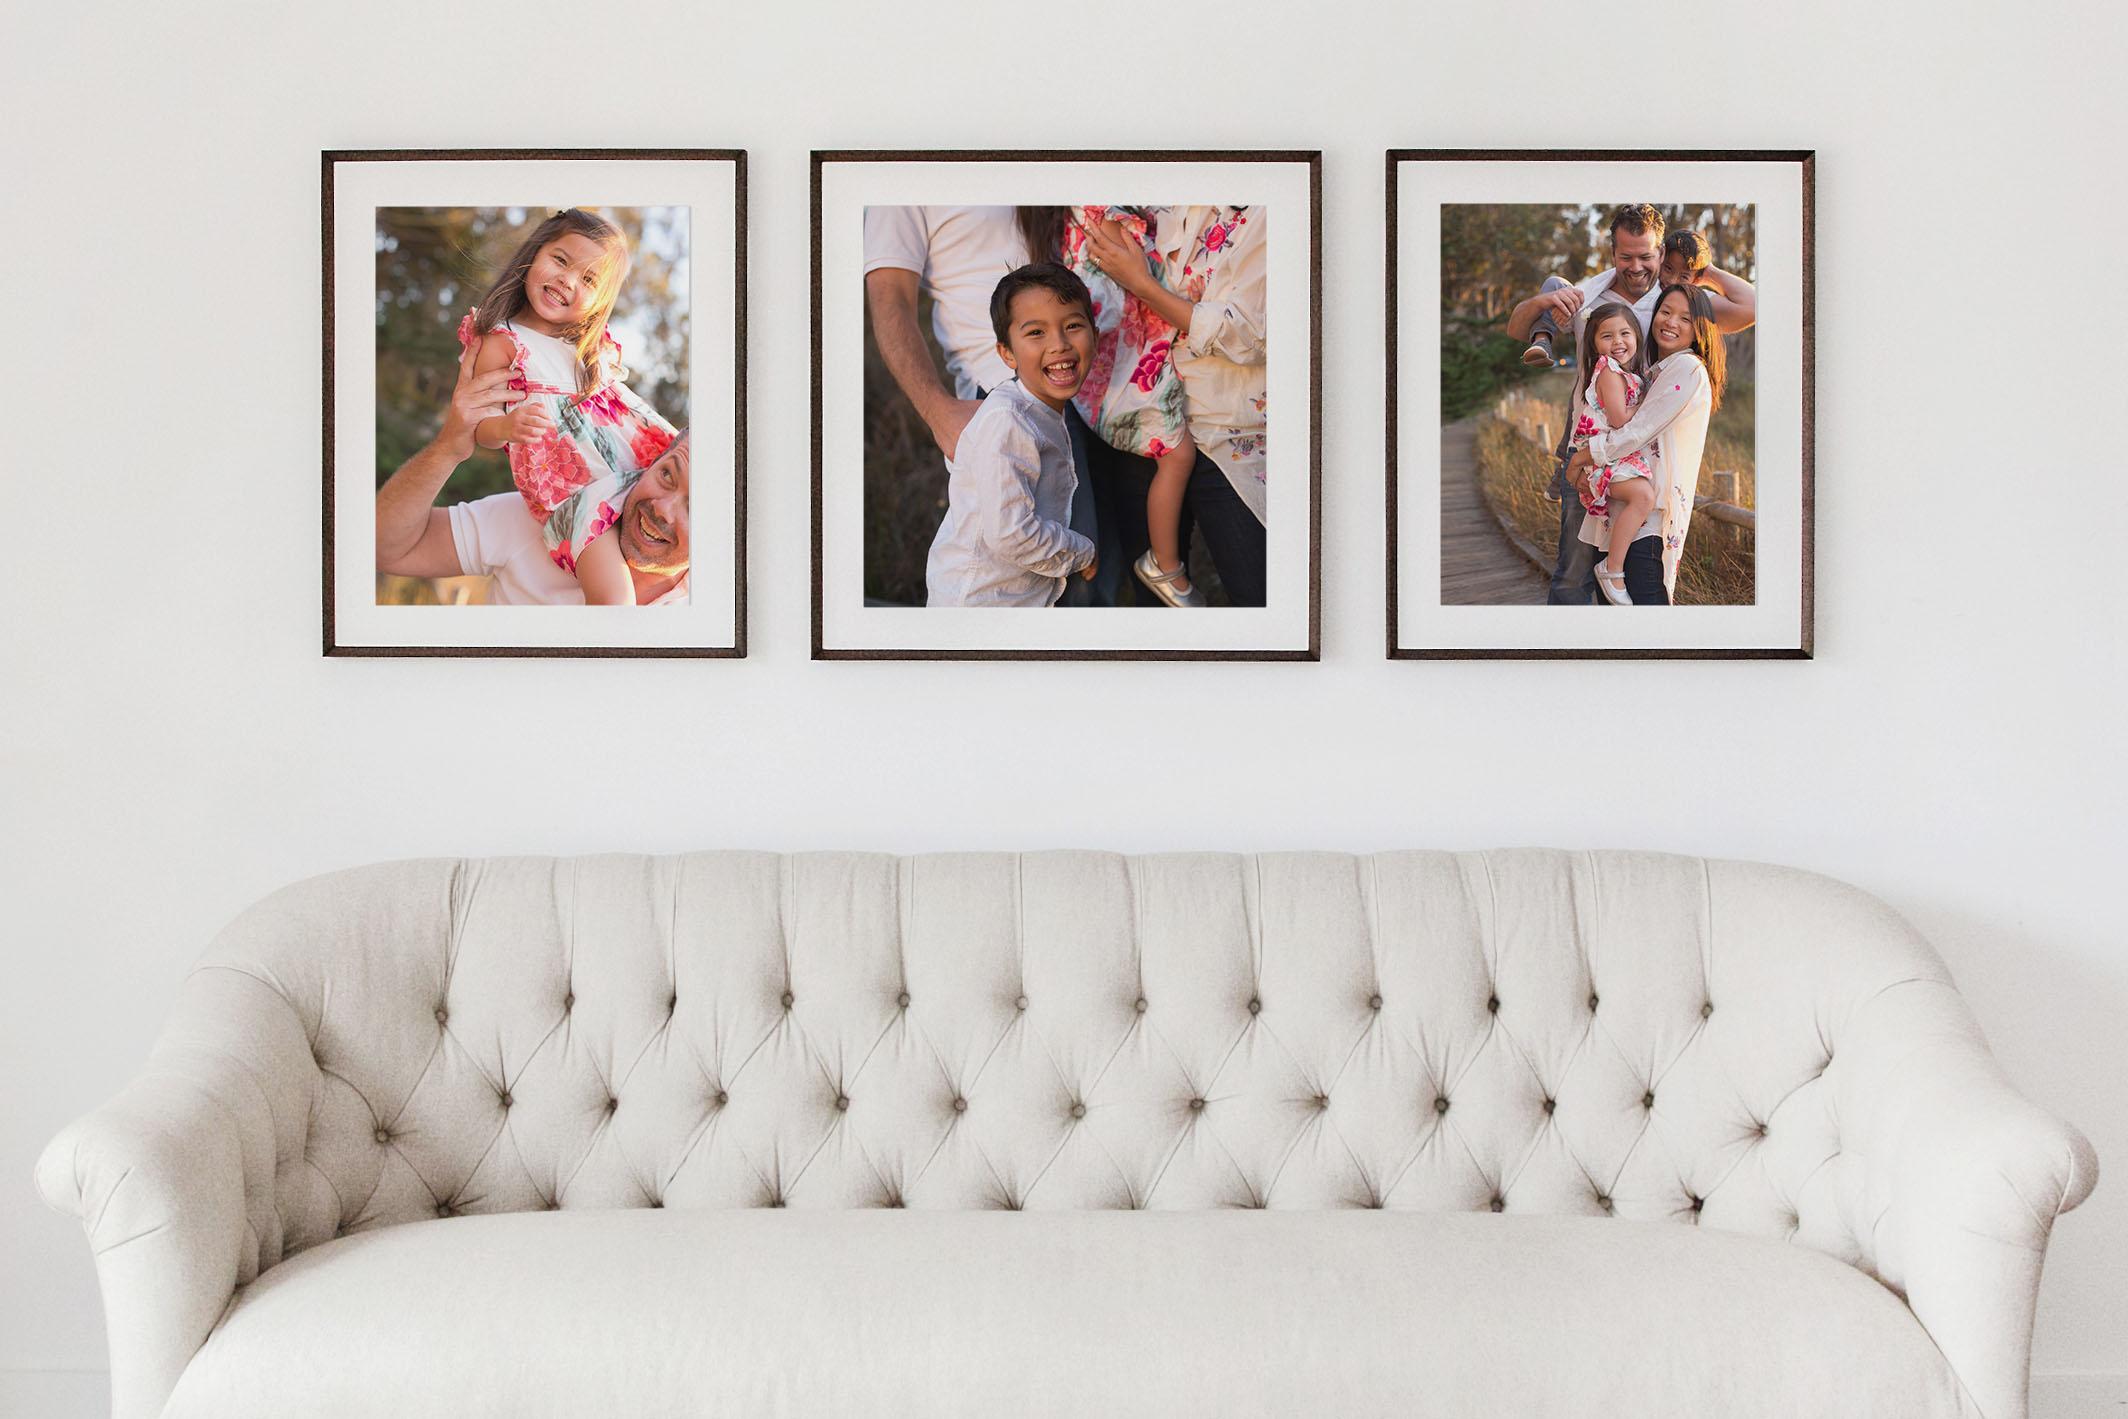 lifestyle-family-photographer-santa-barbara-california.jpg